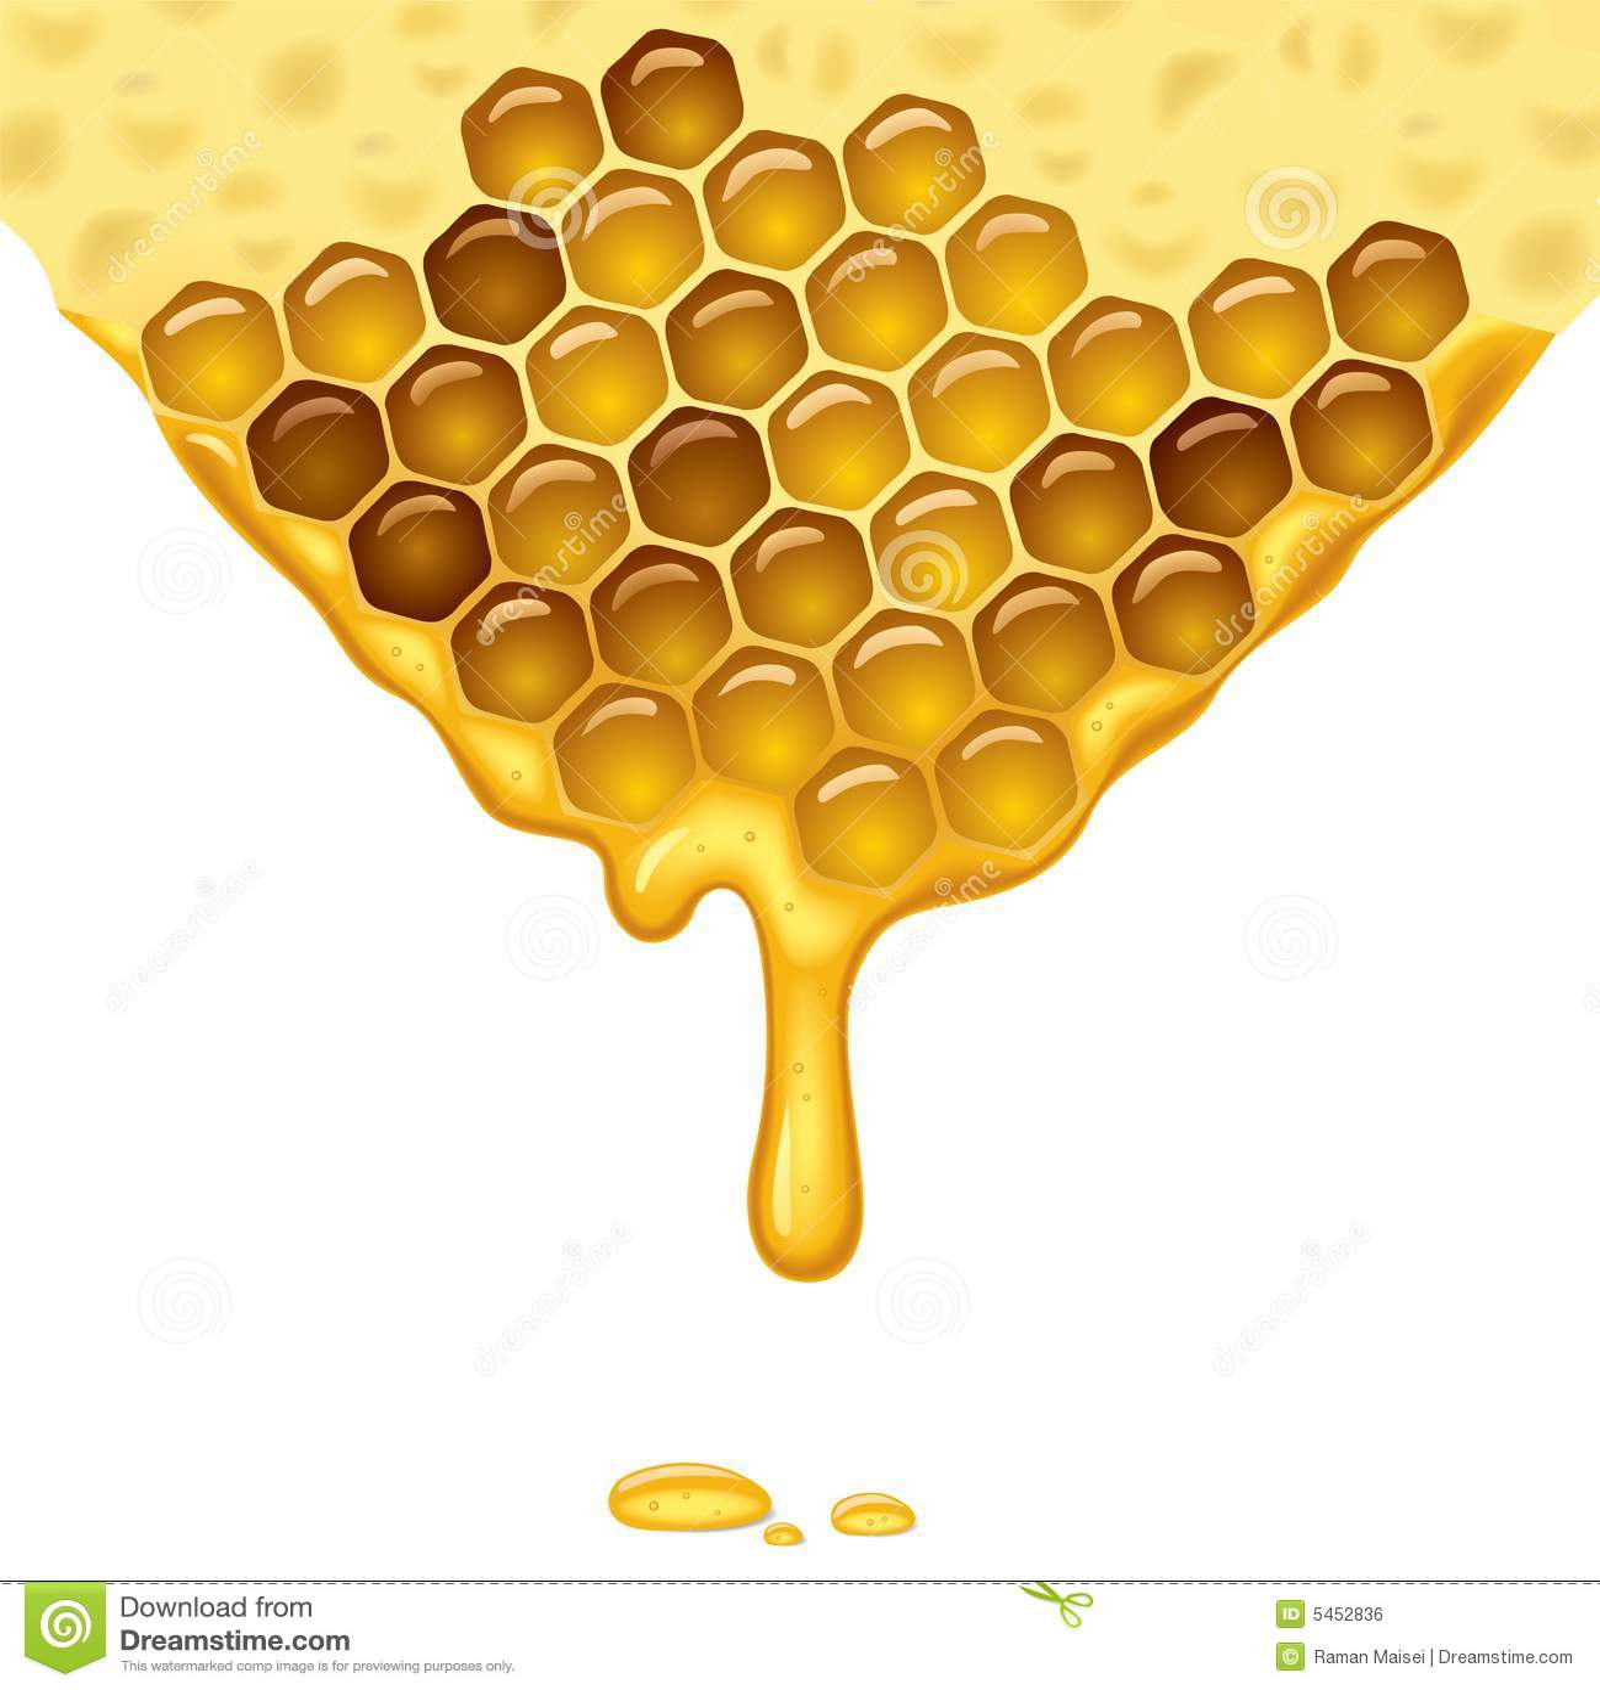 free clipart of honey - photo #31